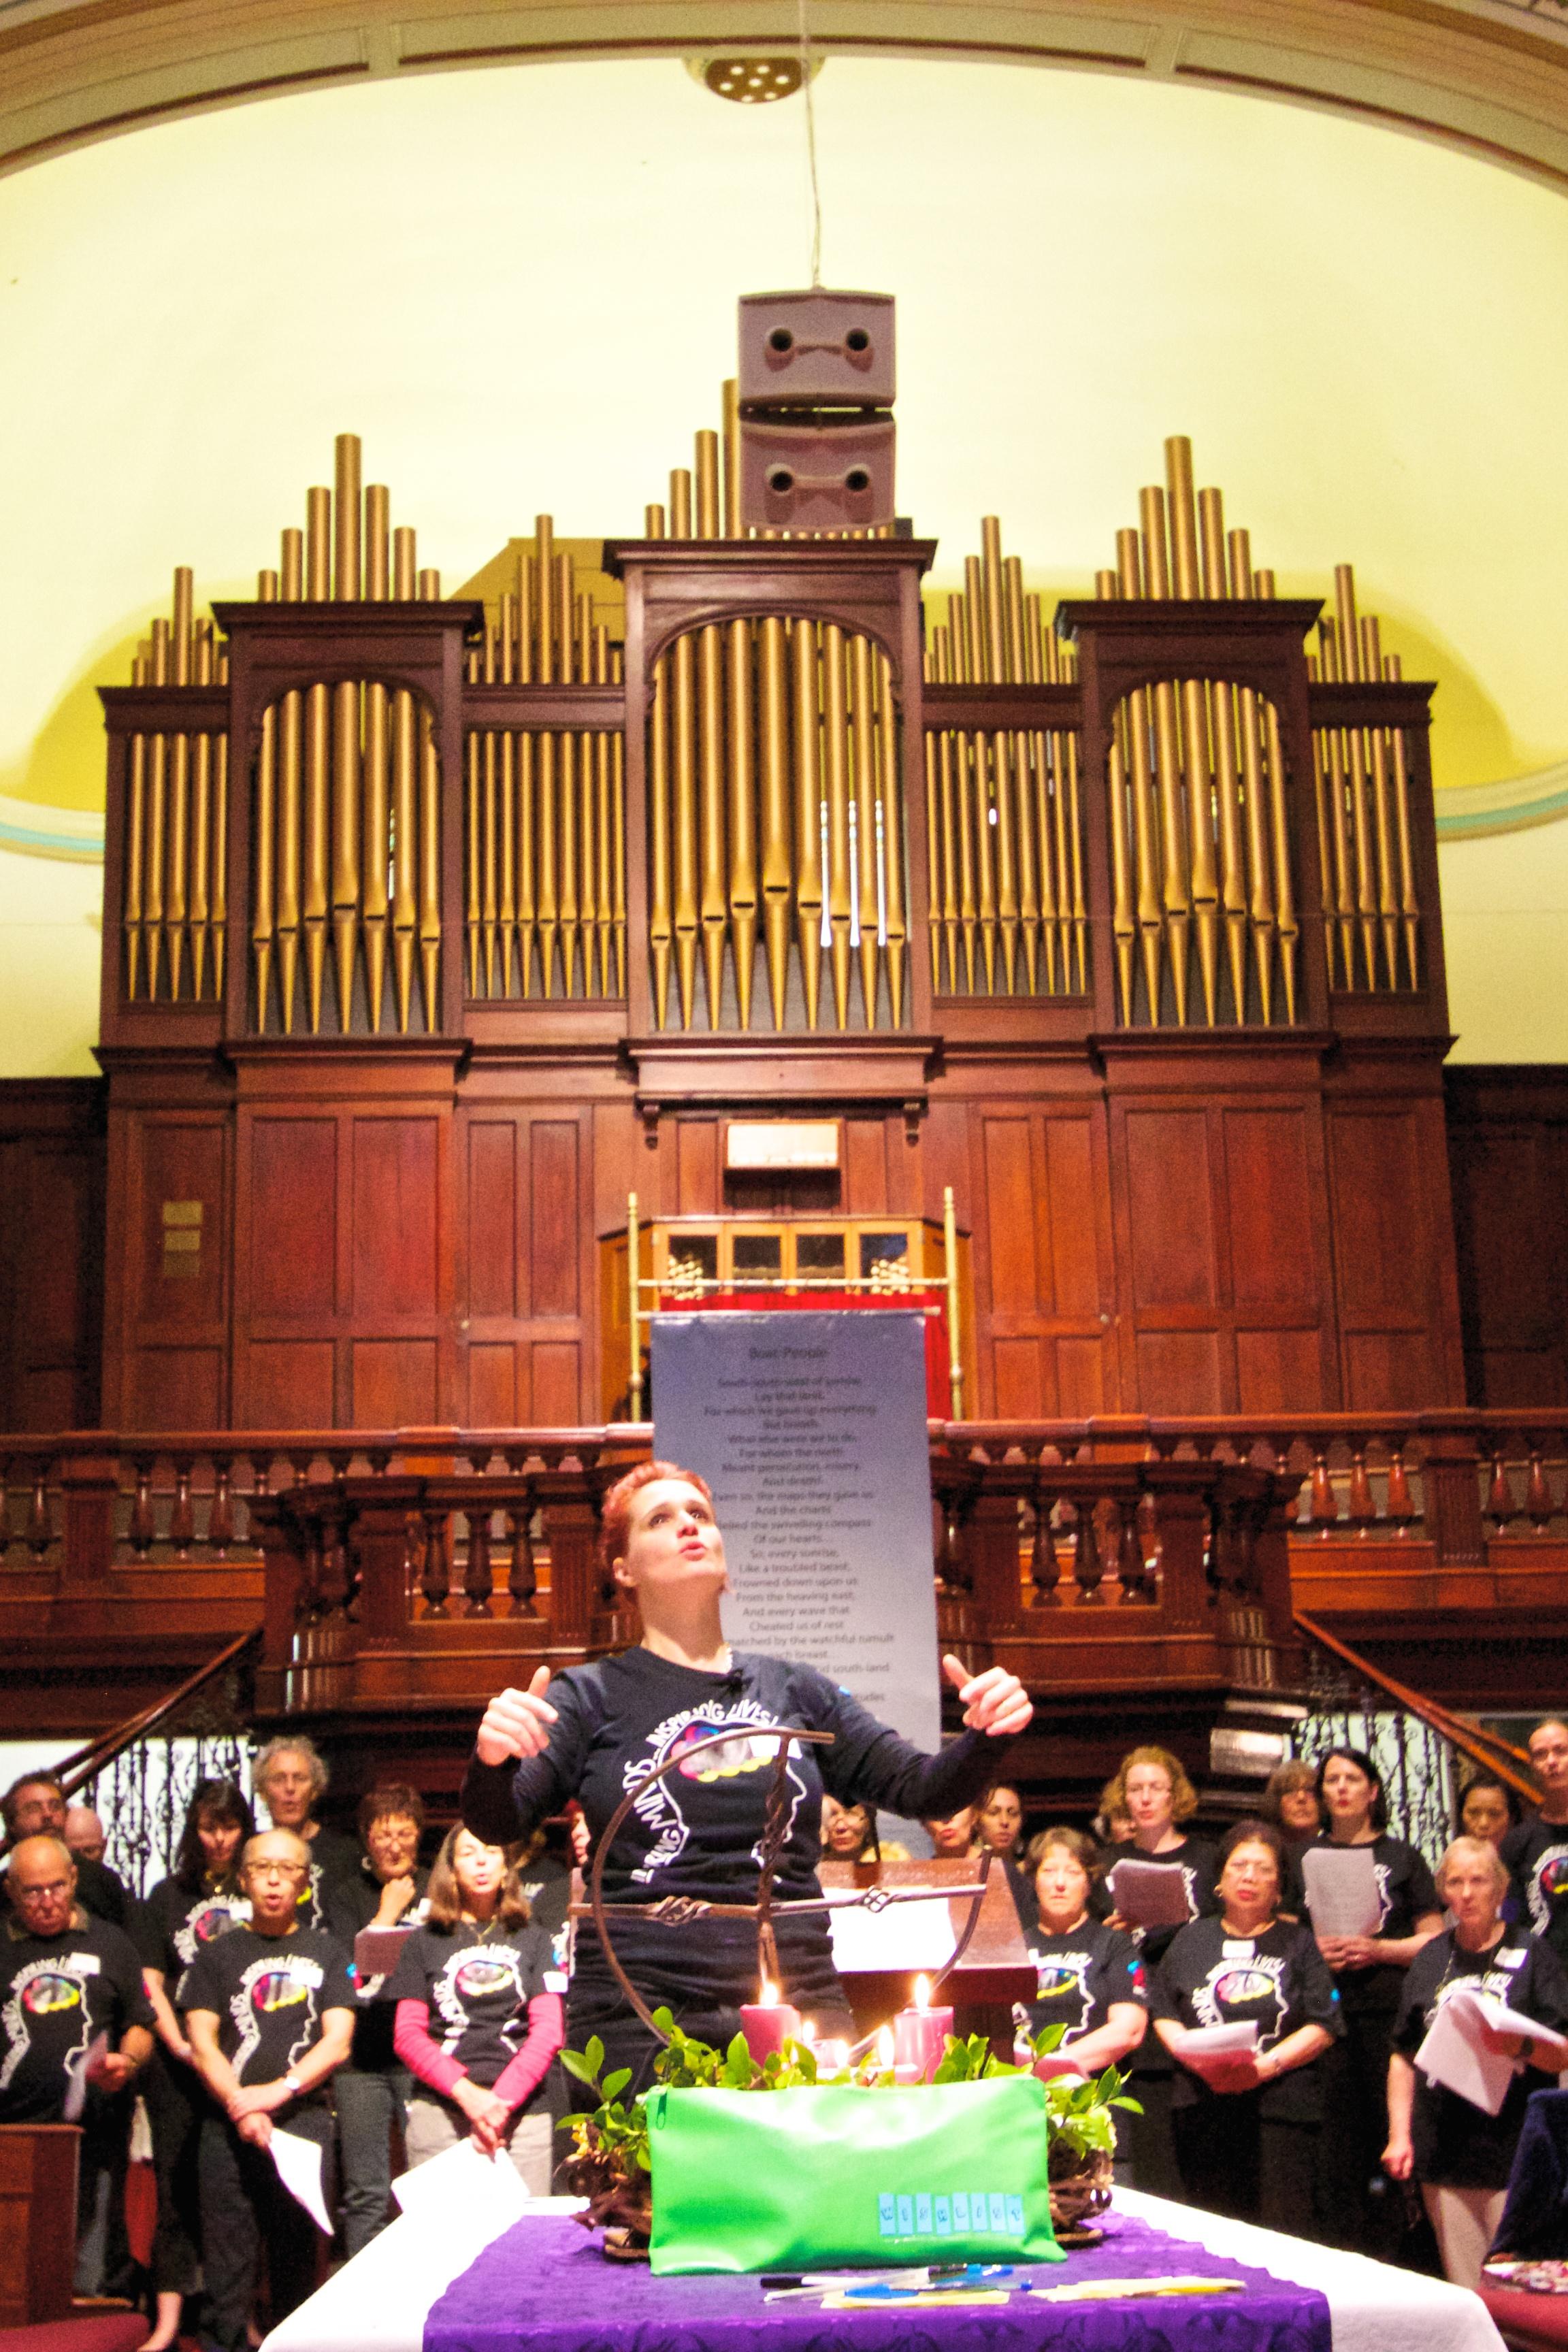 Sydney Sings concert